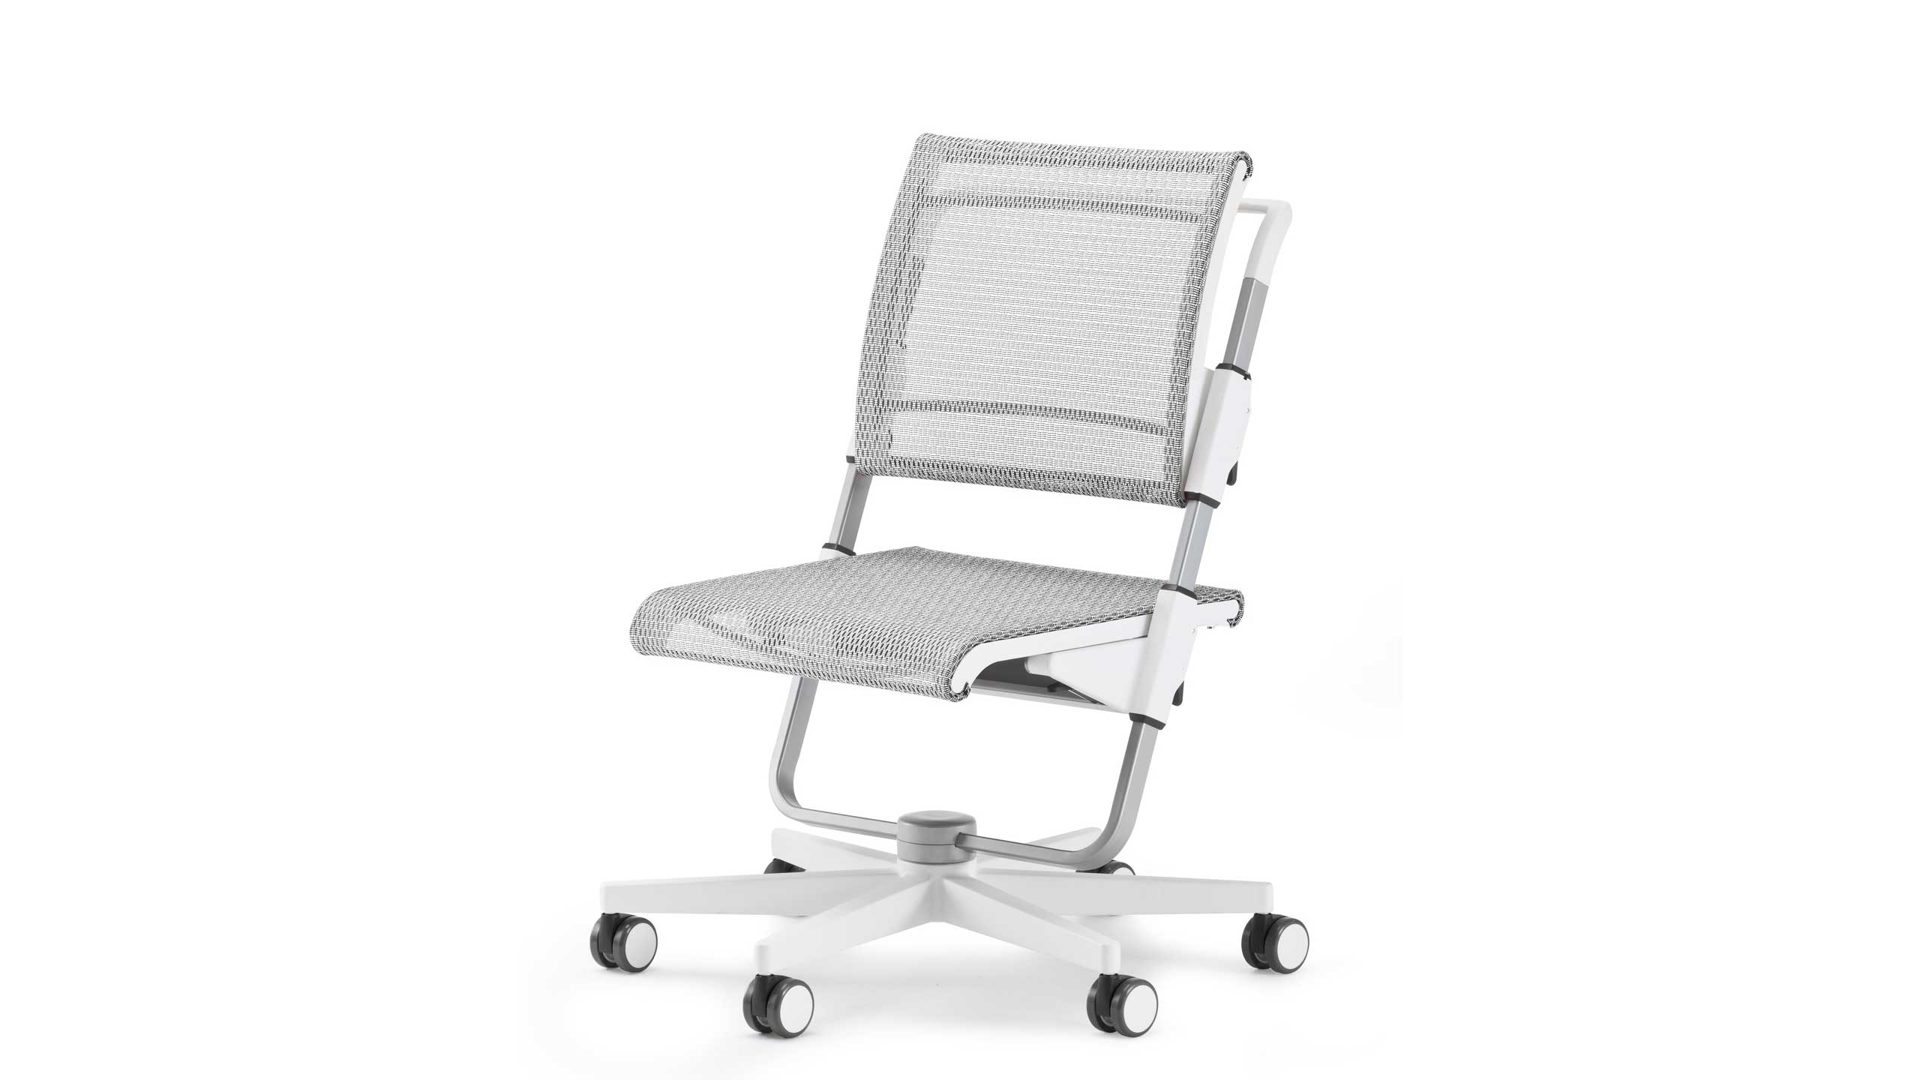 Moll Drehstuhl Schreibtischstuhl Scooter Netzstoff Silber Gestell